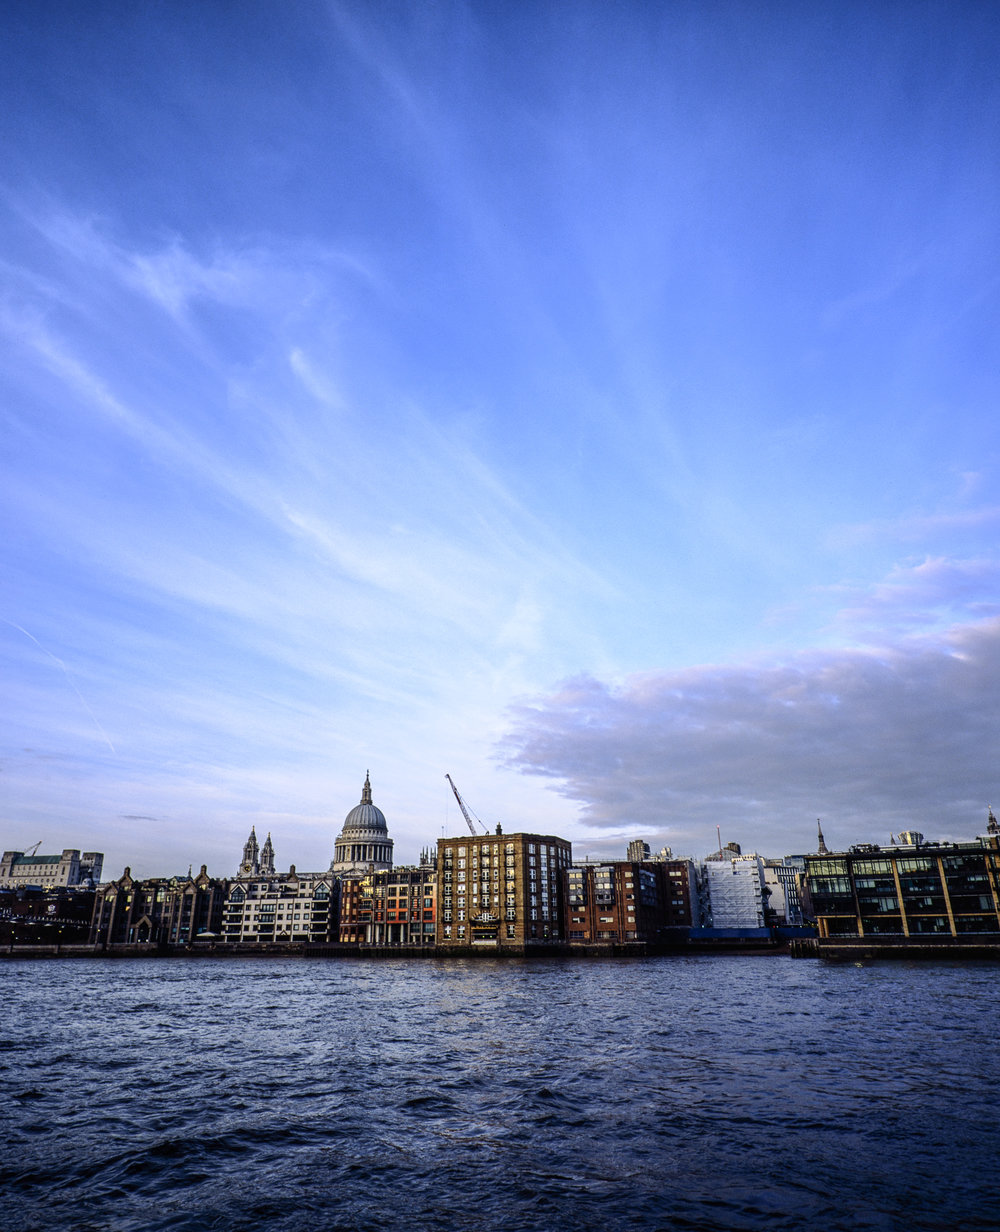 (City of) London, November 2017 - Mamiya 7ii | 43mm f/4.5 | Fujichrome Provia 100F